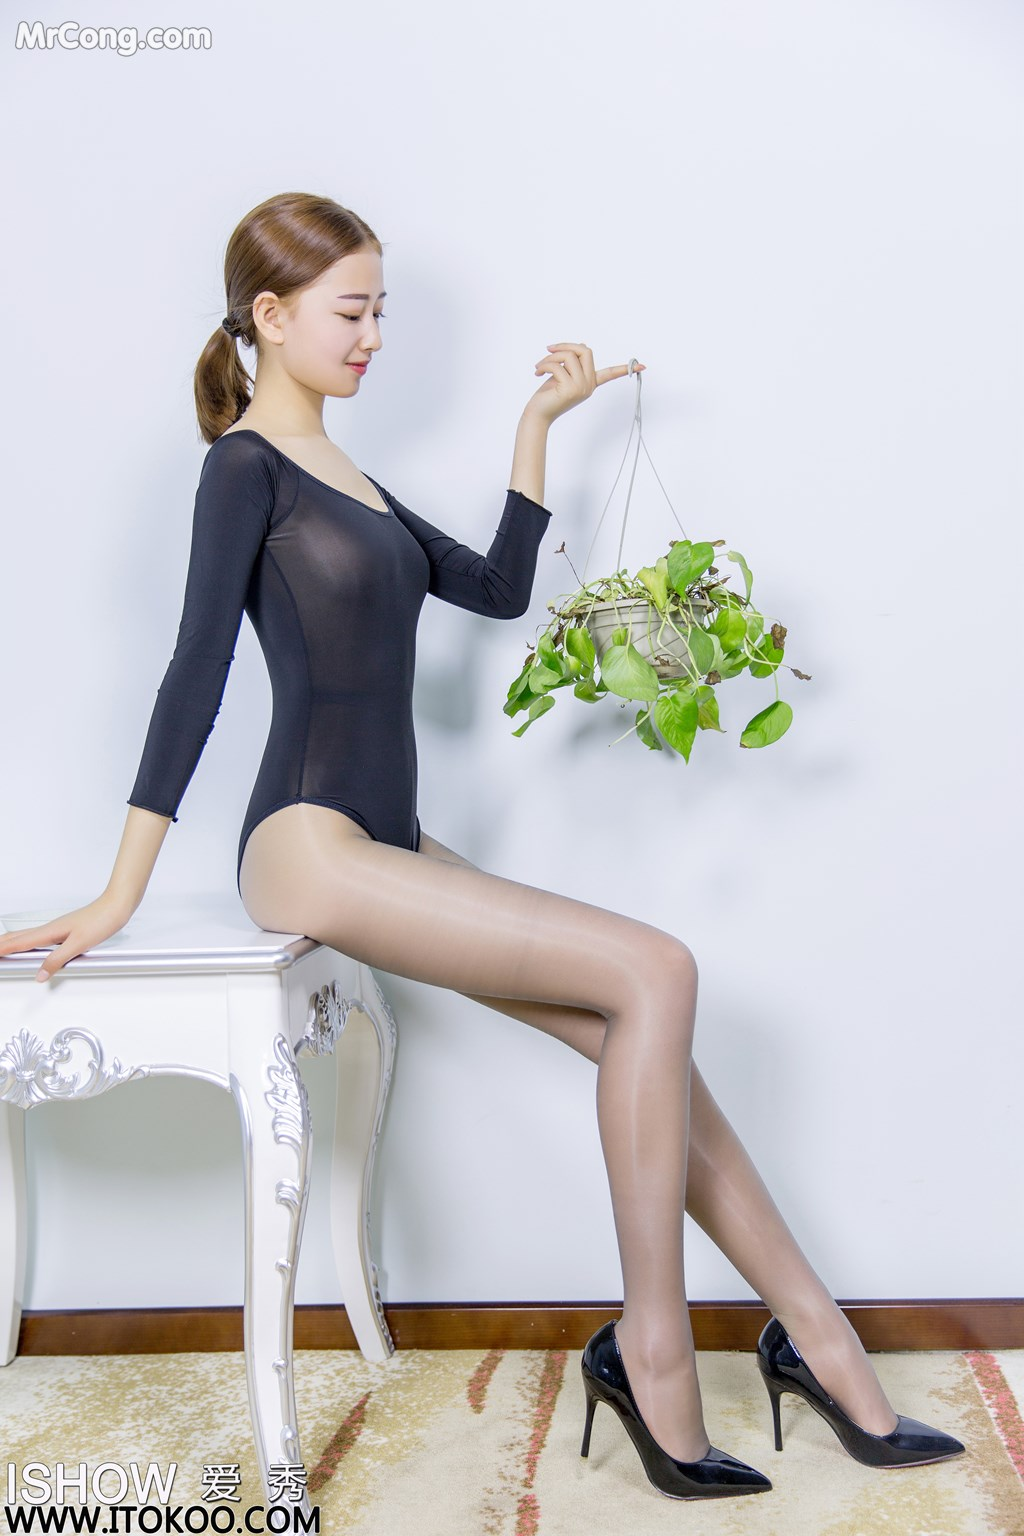 Image ISHOW-No.151-Han-Zhi-Ying-Flora-MrCong.com-010 in post ISHOW No.151: Người mẫu Han Zhi Ying (寒栀樱Flora) (31 ảnh)